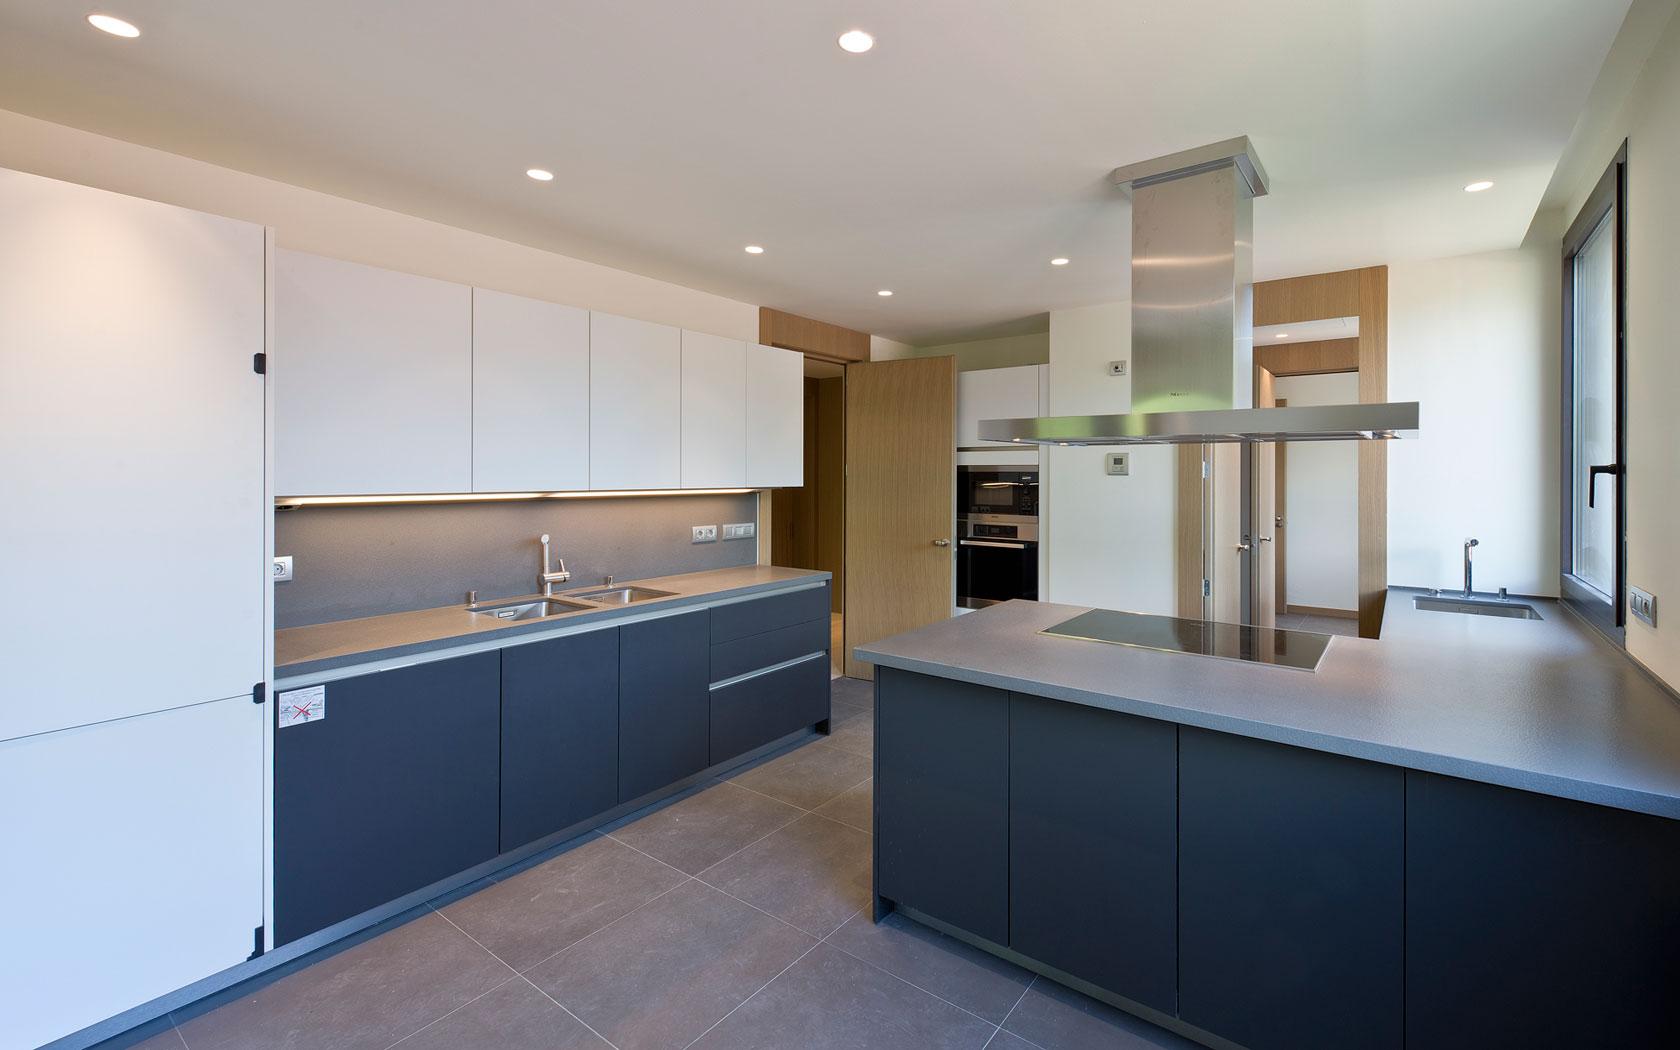 Apartment for Sale at Exclusive development in Pedralbes Zona Alta, Barcelona City, Barcelona 08034 Spain